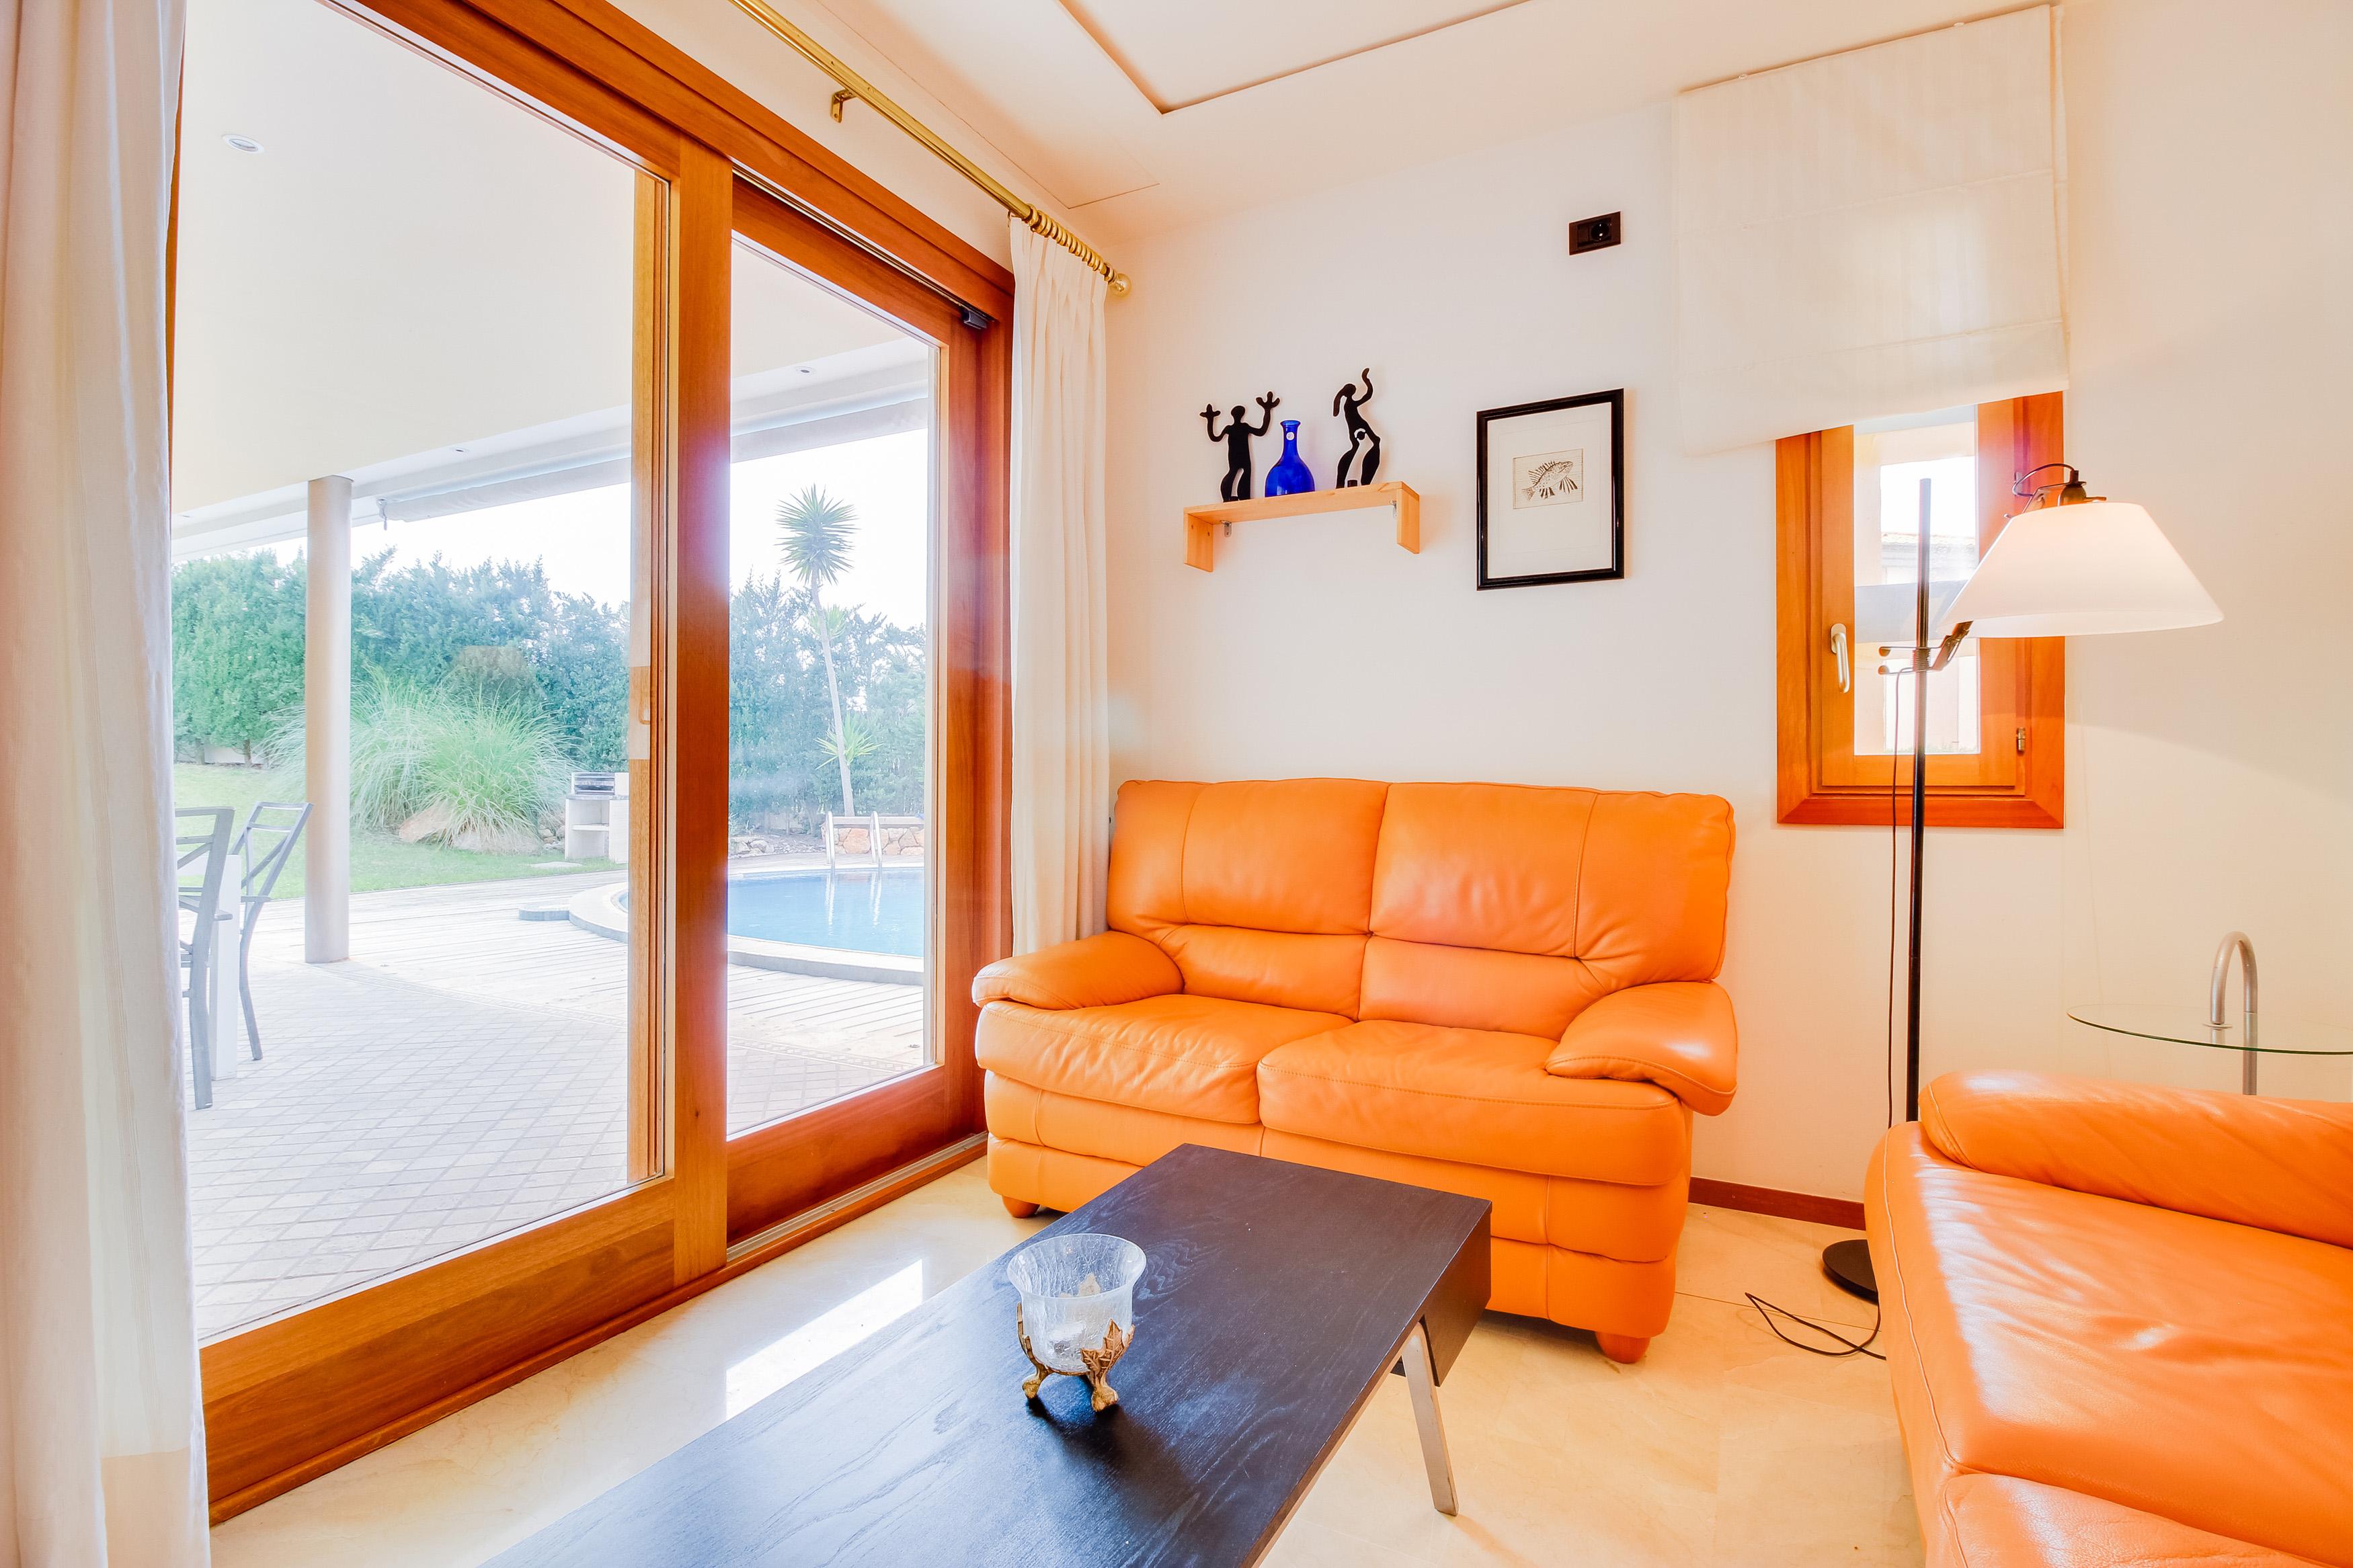 Apartment Villa Cala Blava photo 20399453